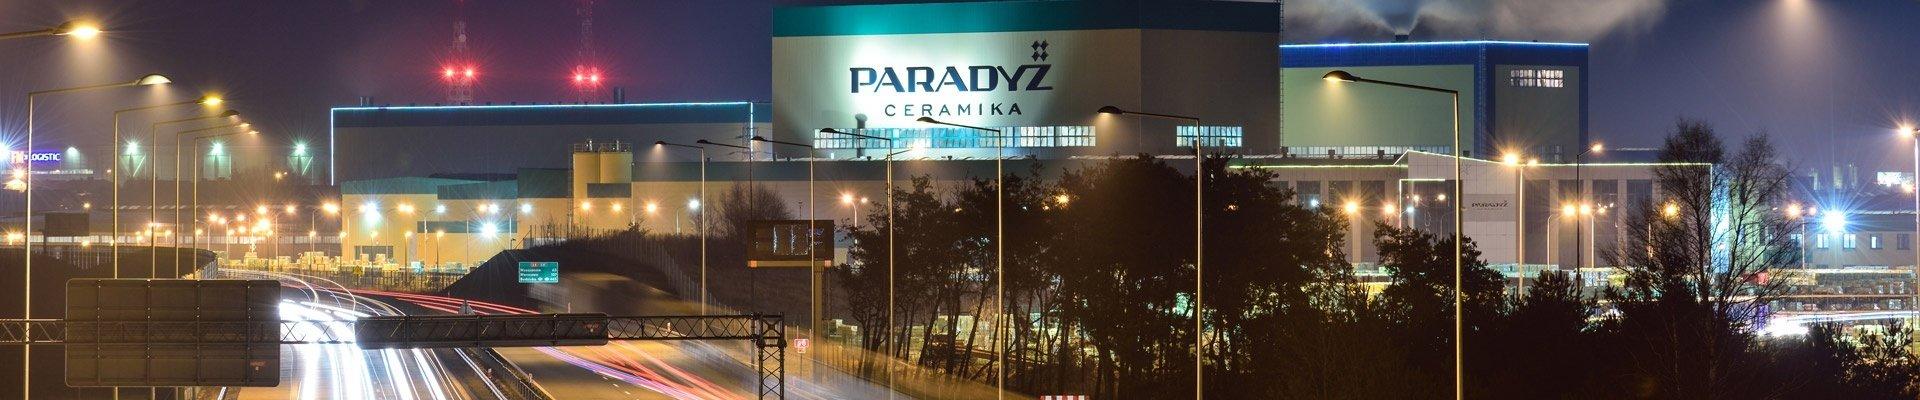 New client: MakoLab will conduct SEO operations for Ceramika Paradyż